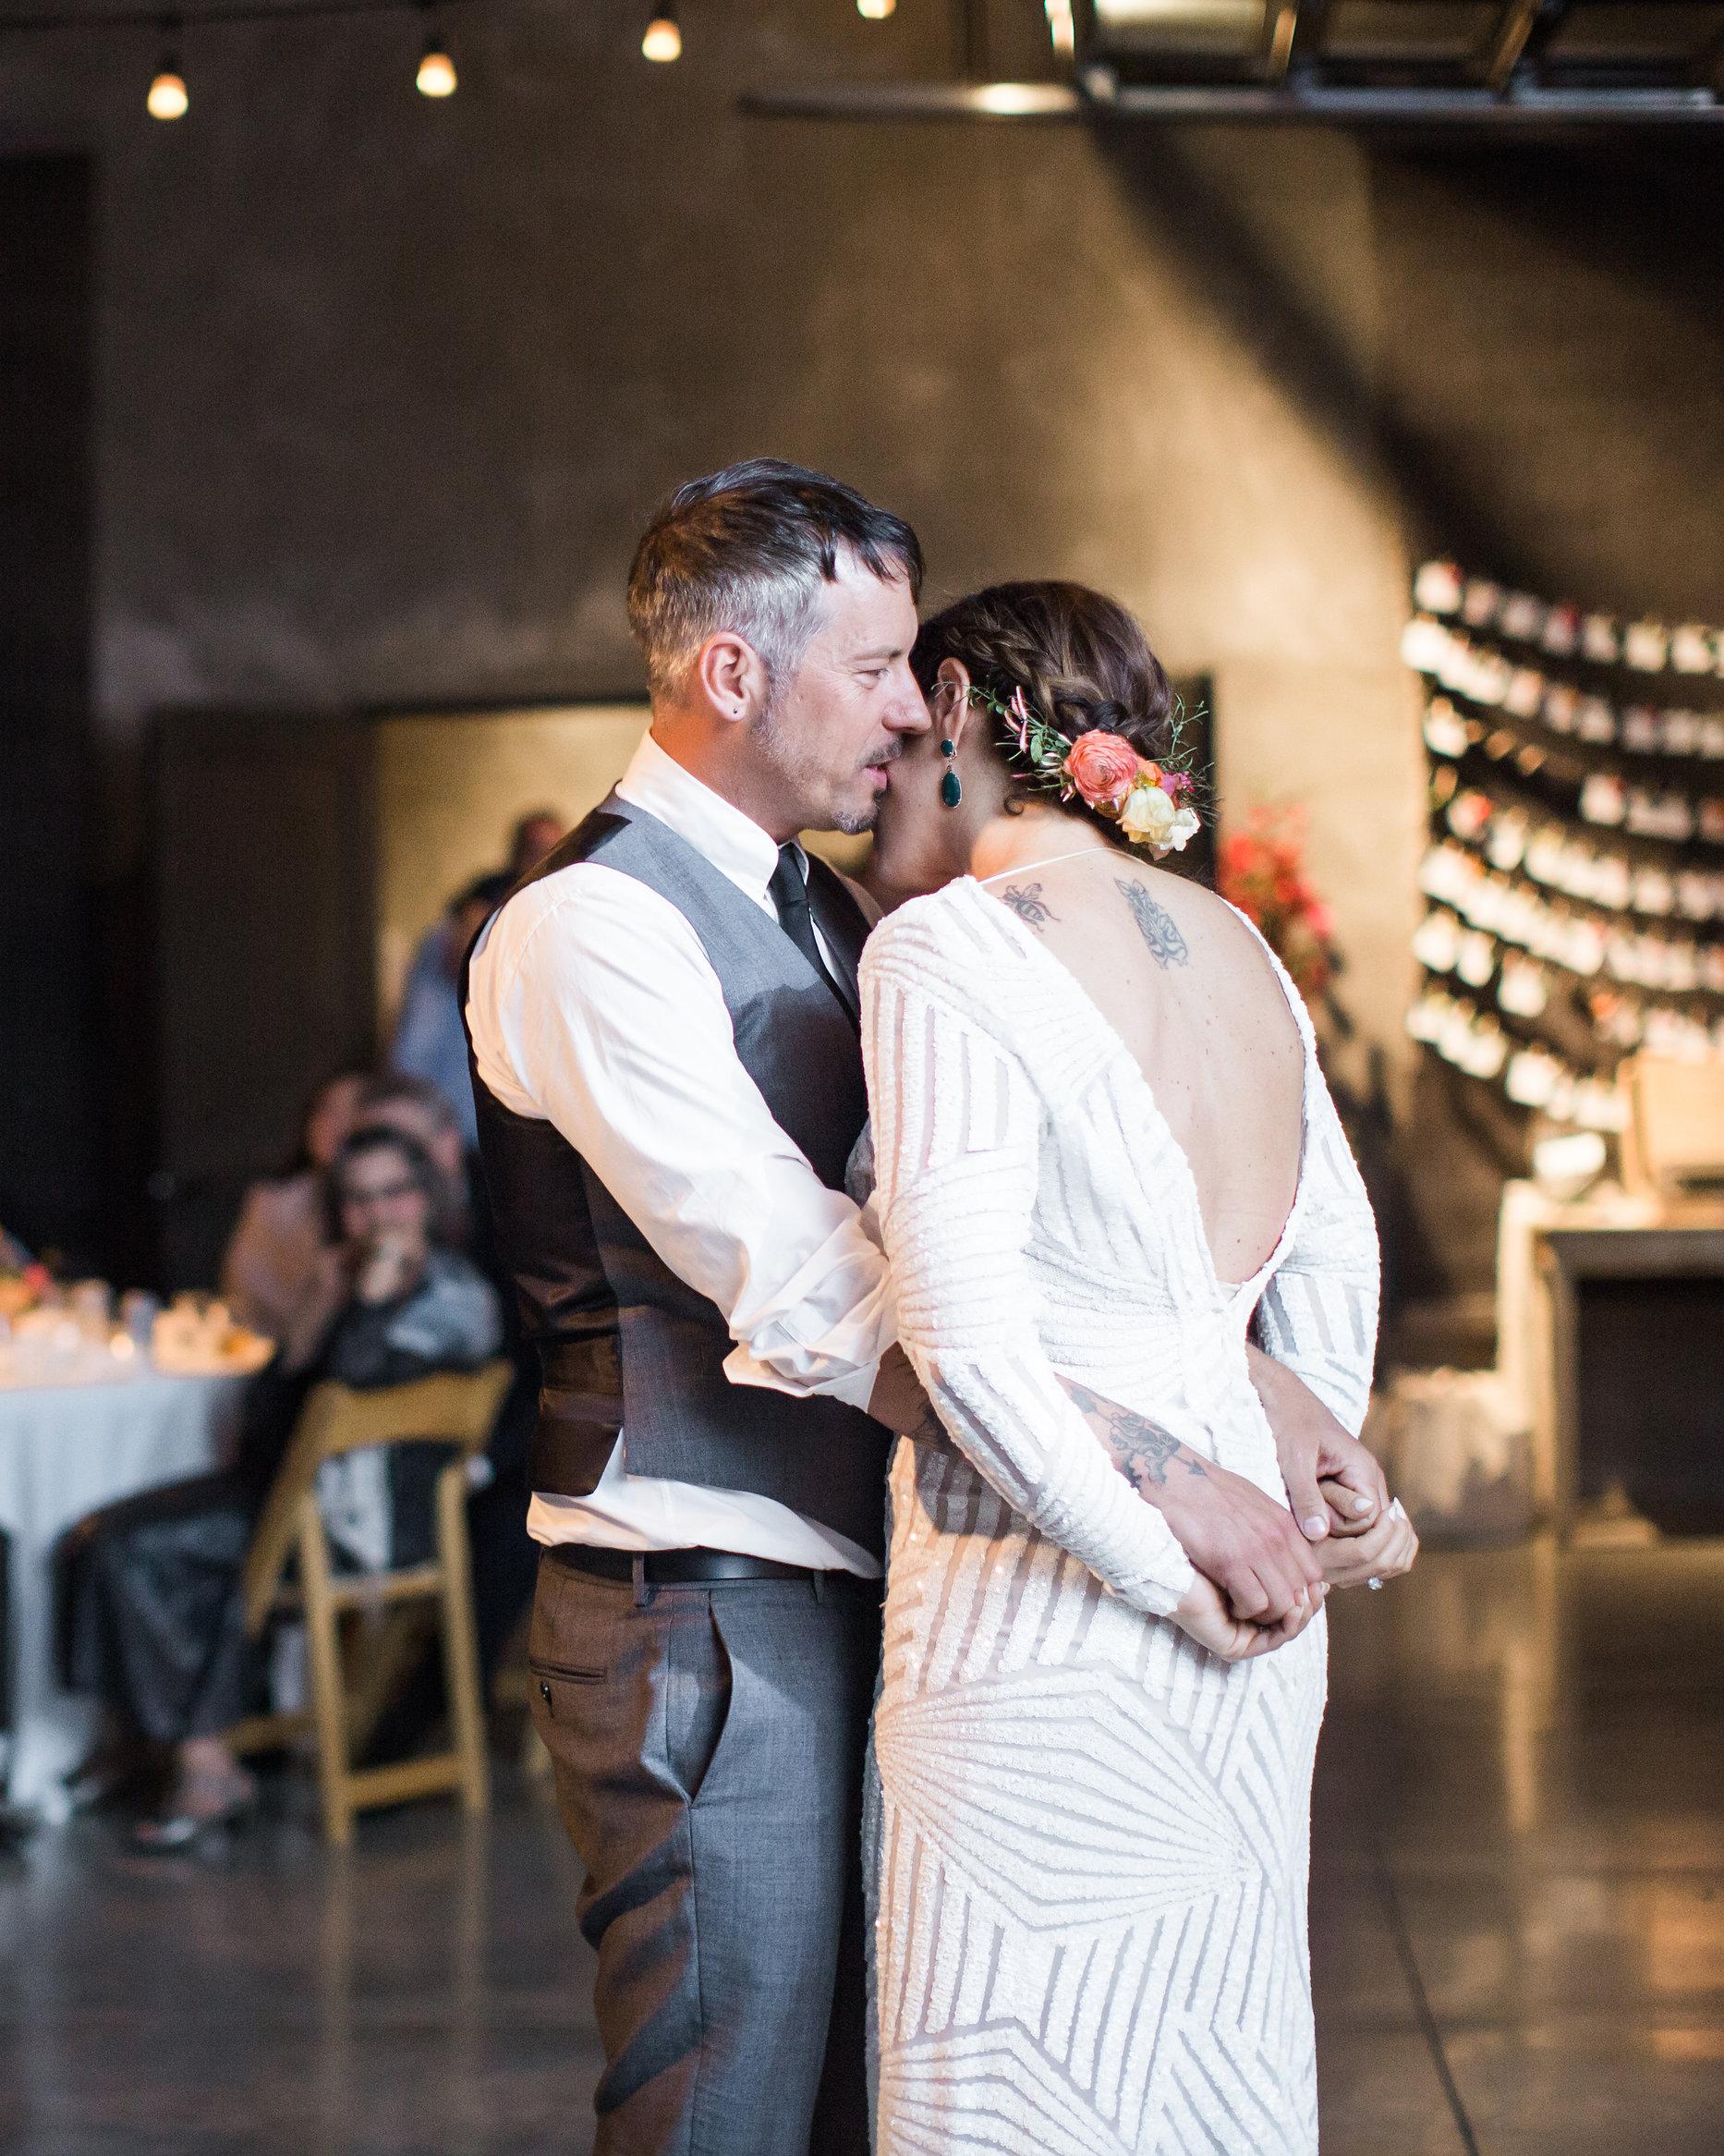 lara-chad-wedding-firstdance-719-s112306-1115.jpg